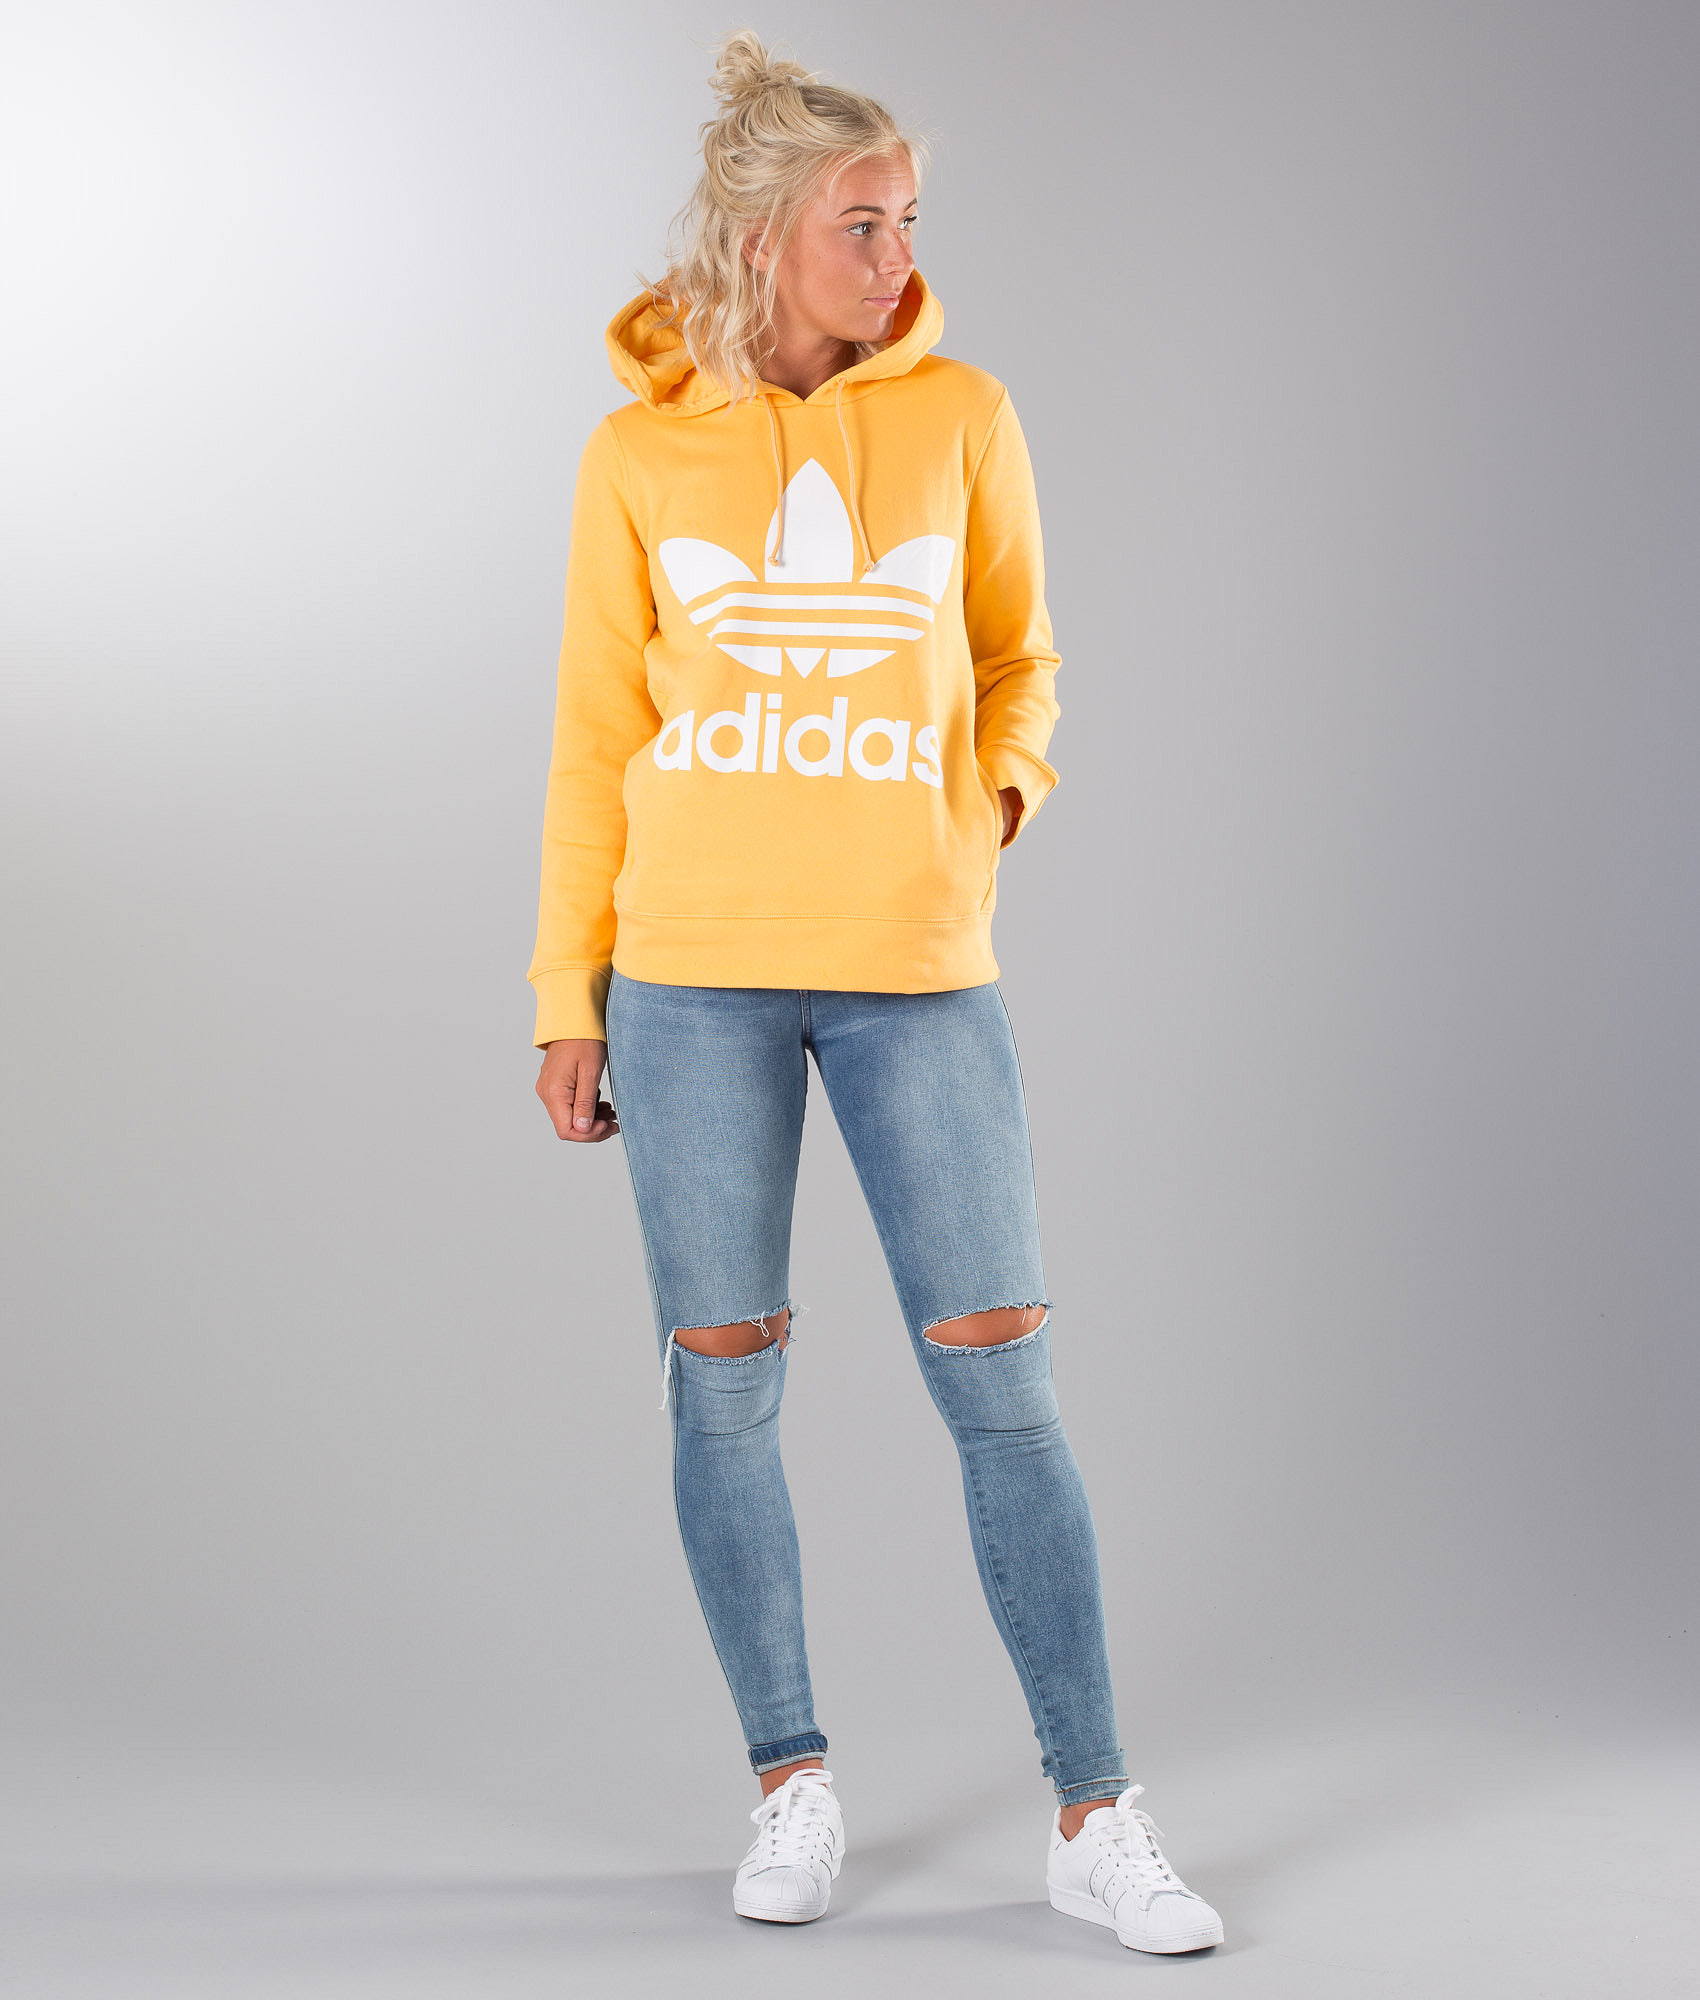 77dba0ce Adidas Originals Trefoil Hoodie Chalk Orange - Ridestore.com